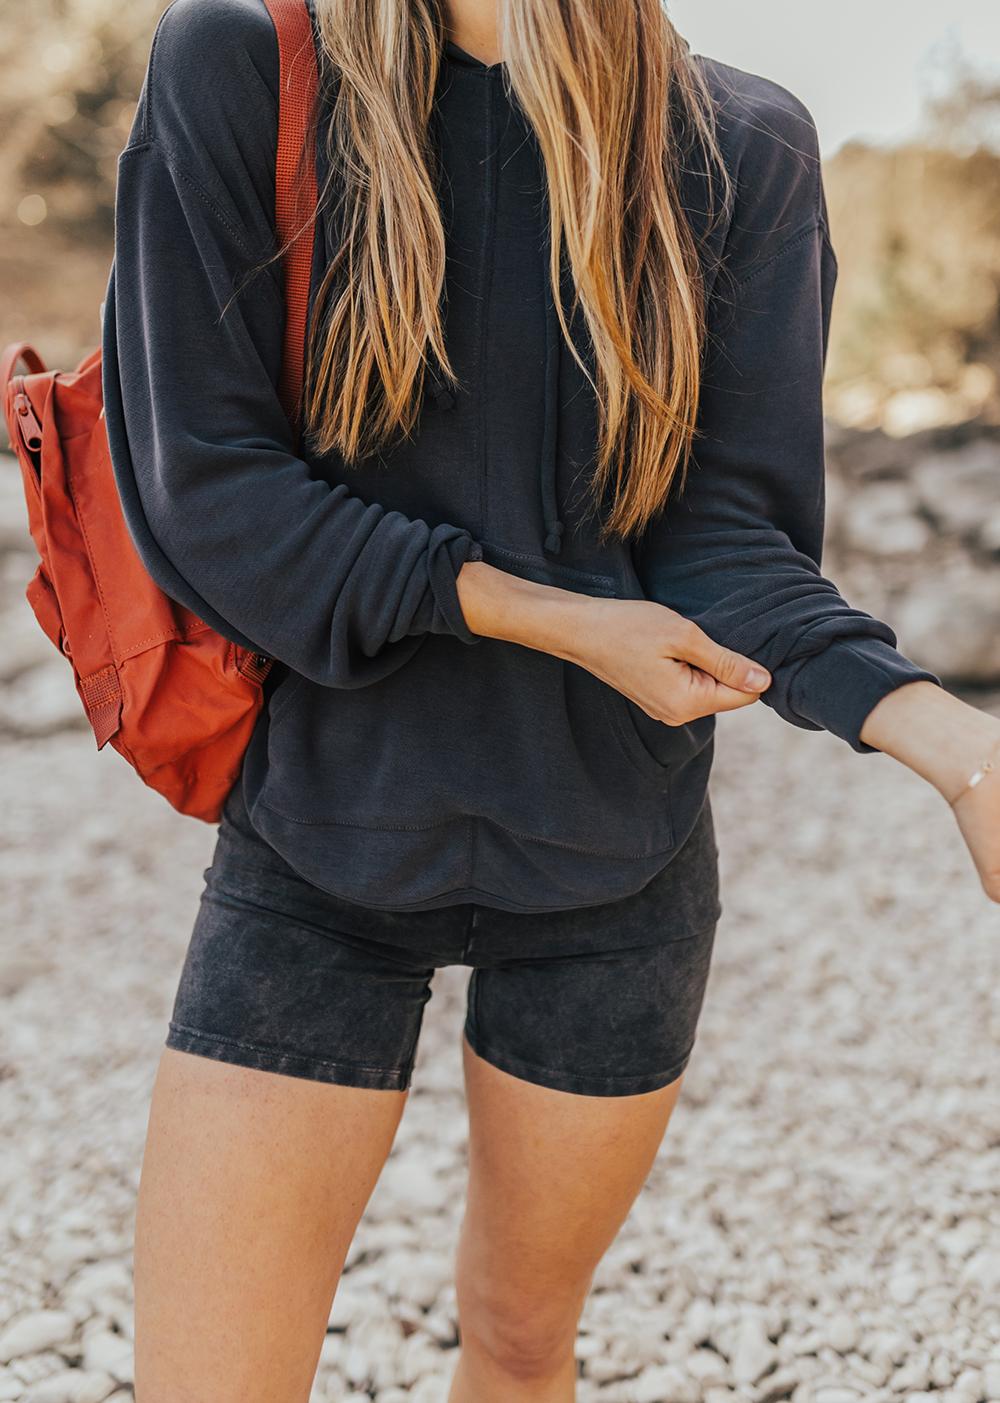 livvyland-blog-olivia-watson-austin-texas-lifestyle-fashion-blogger-greenbelt-hike-free-people-fp-movement-hot-shot-bike-shorts-outfit-4